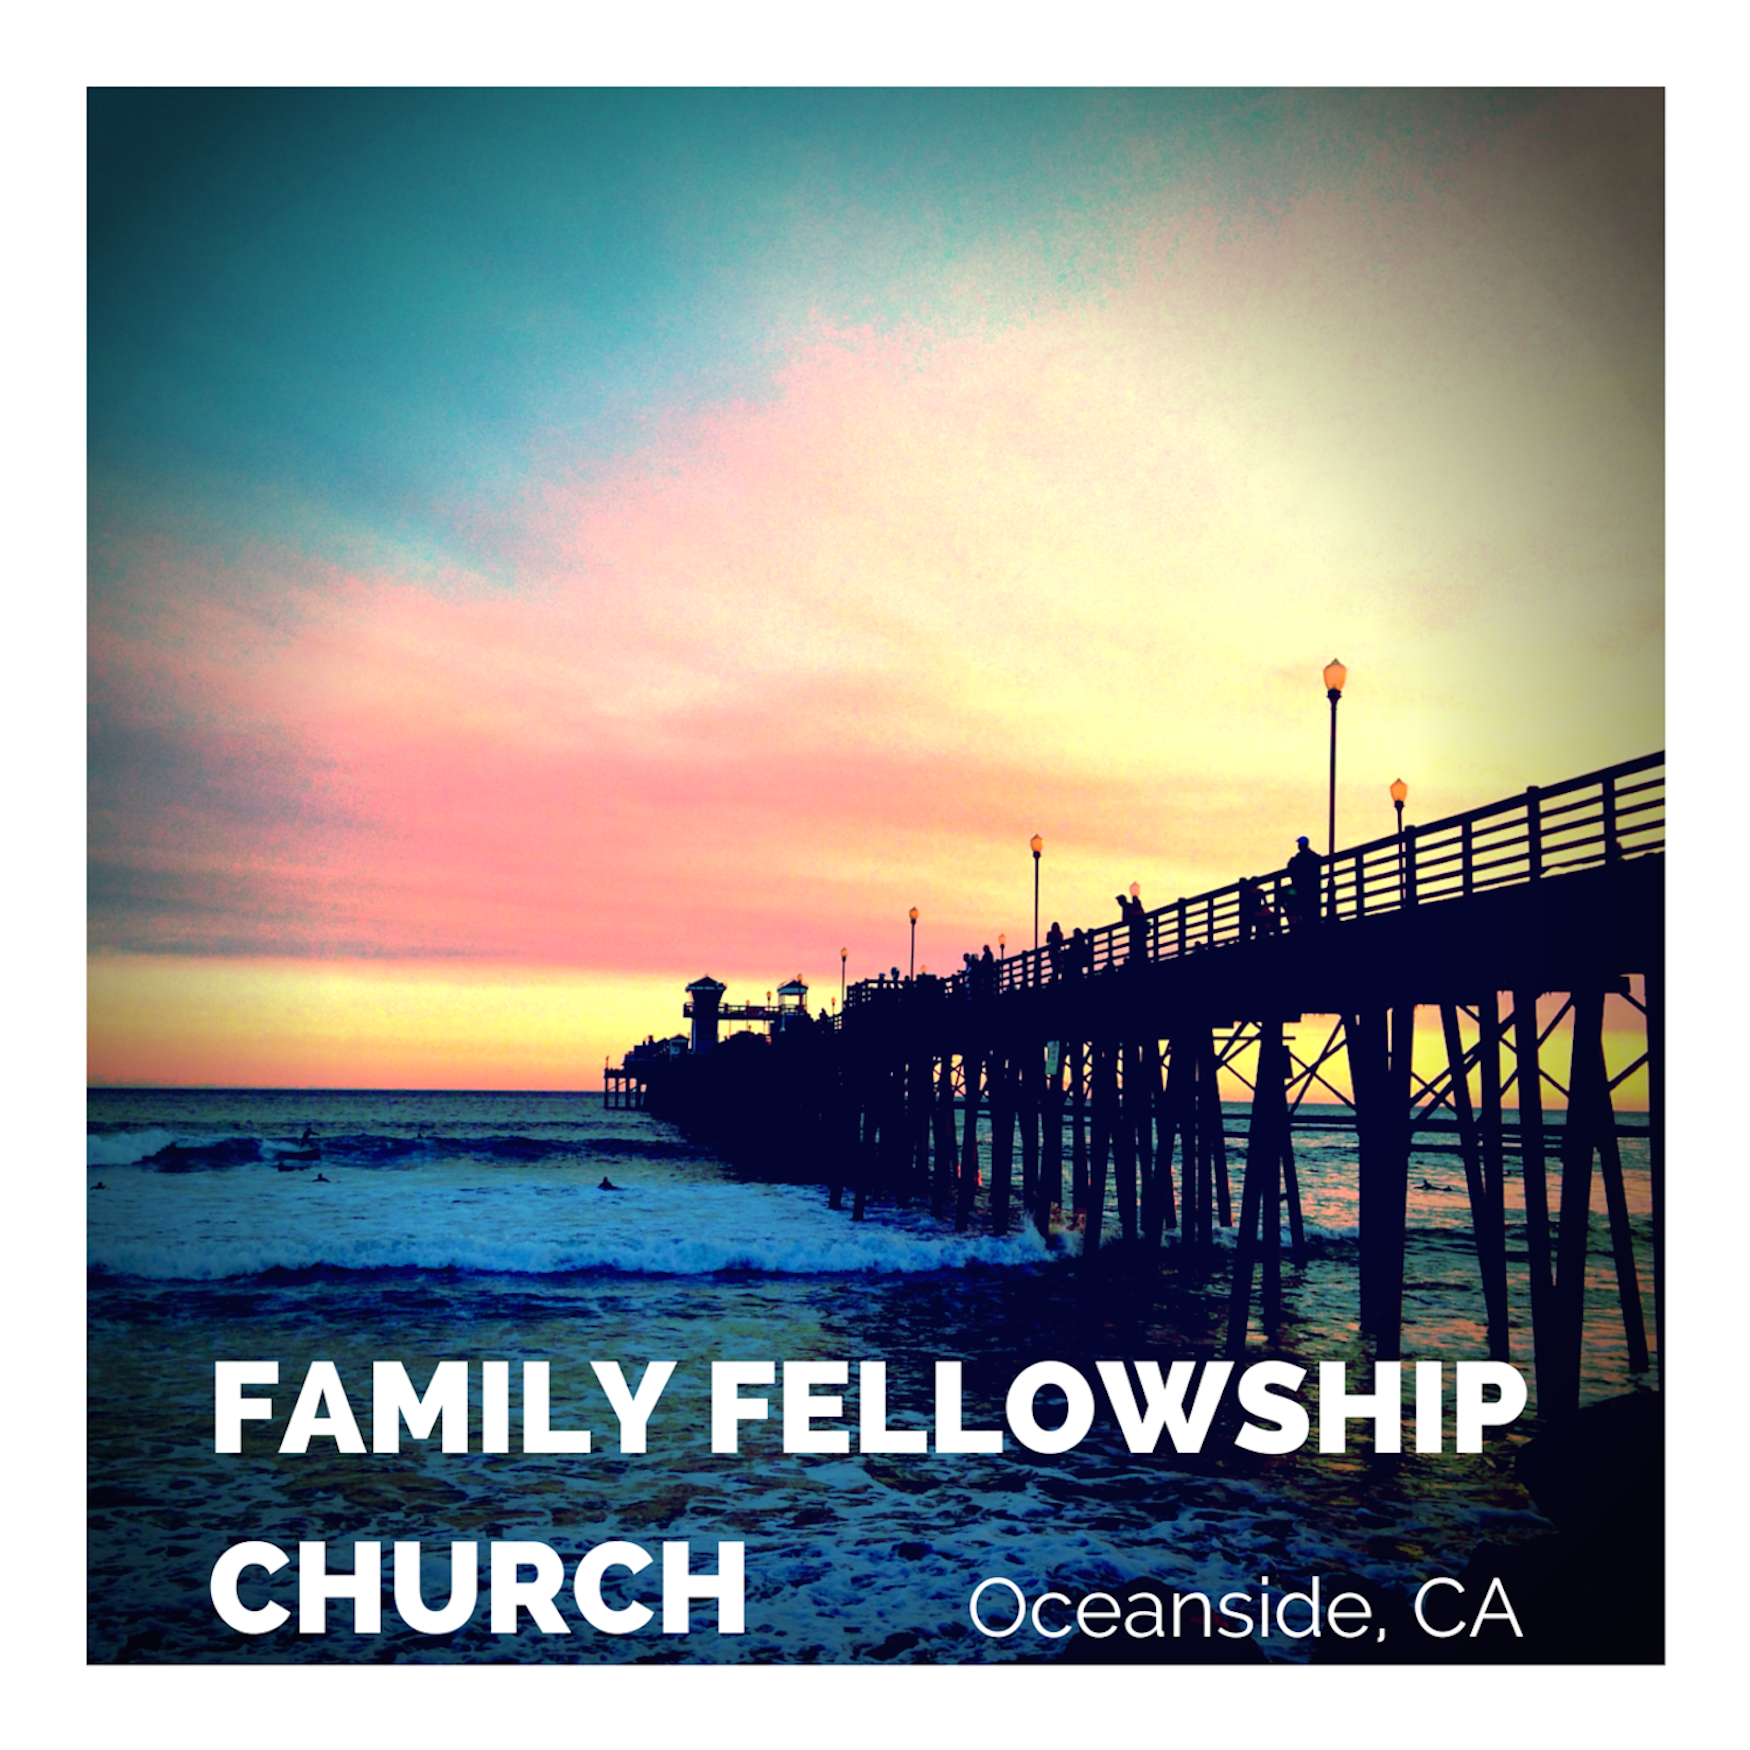 Family Fellowship Church